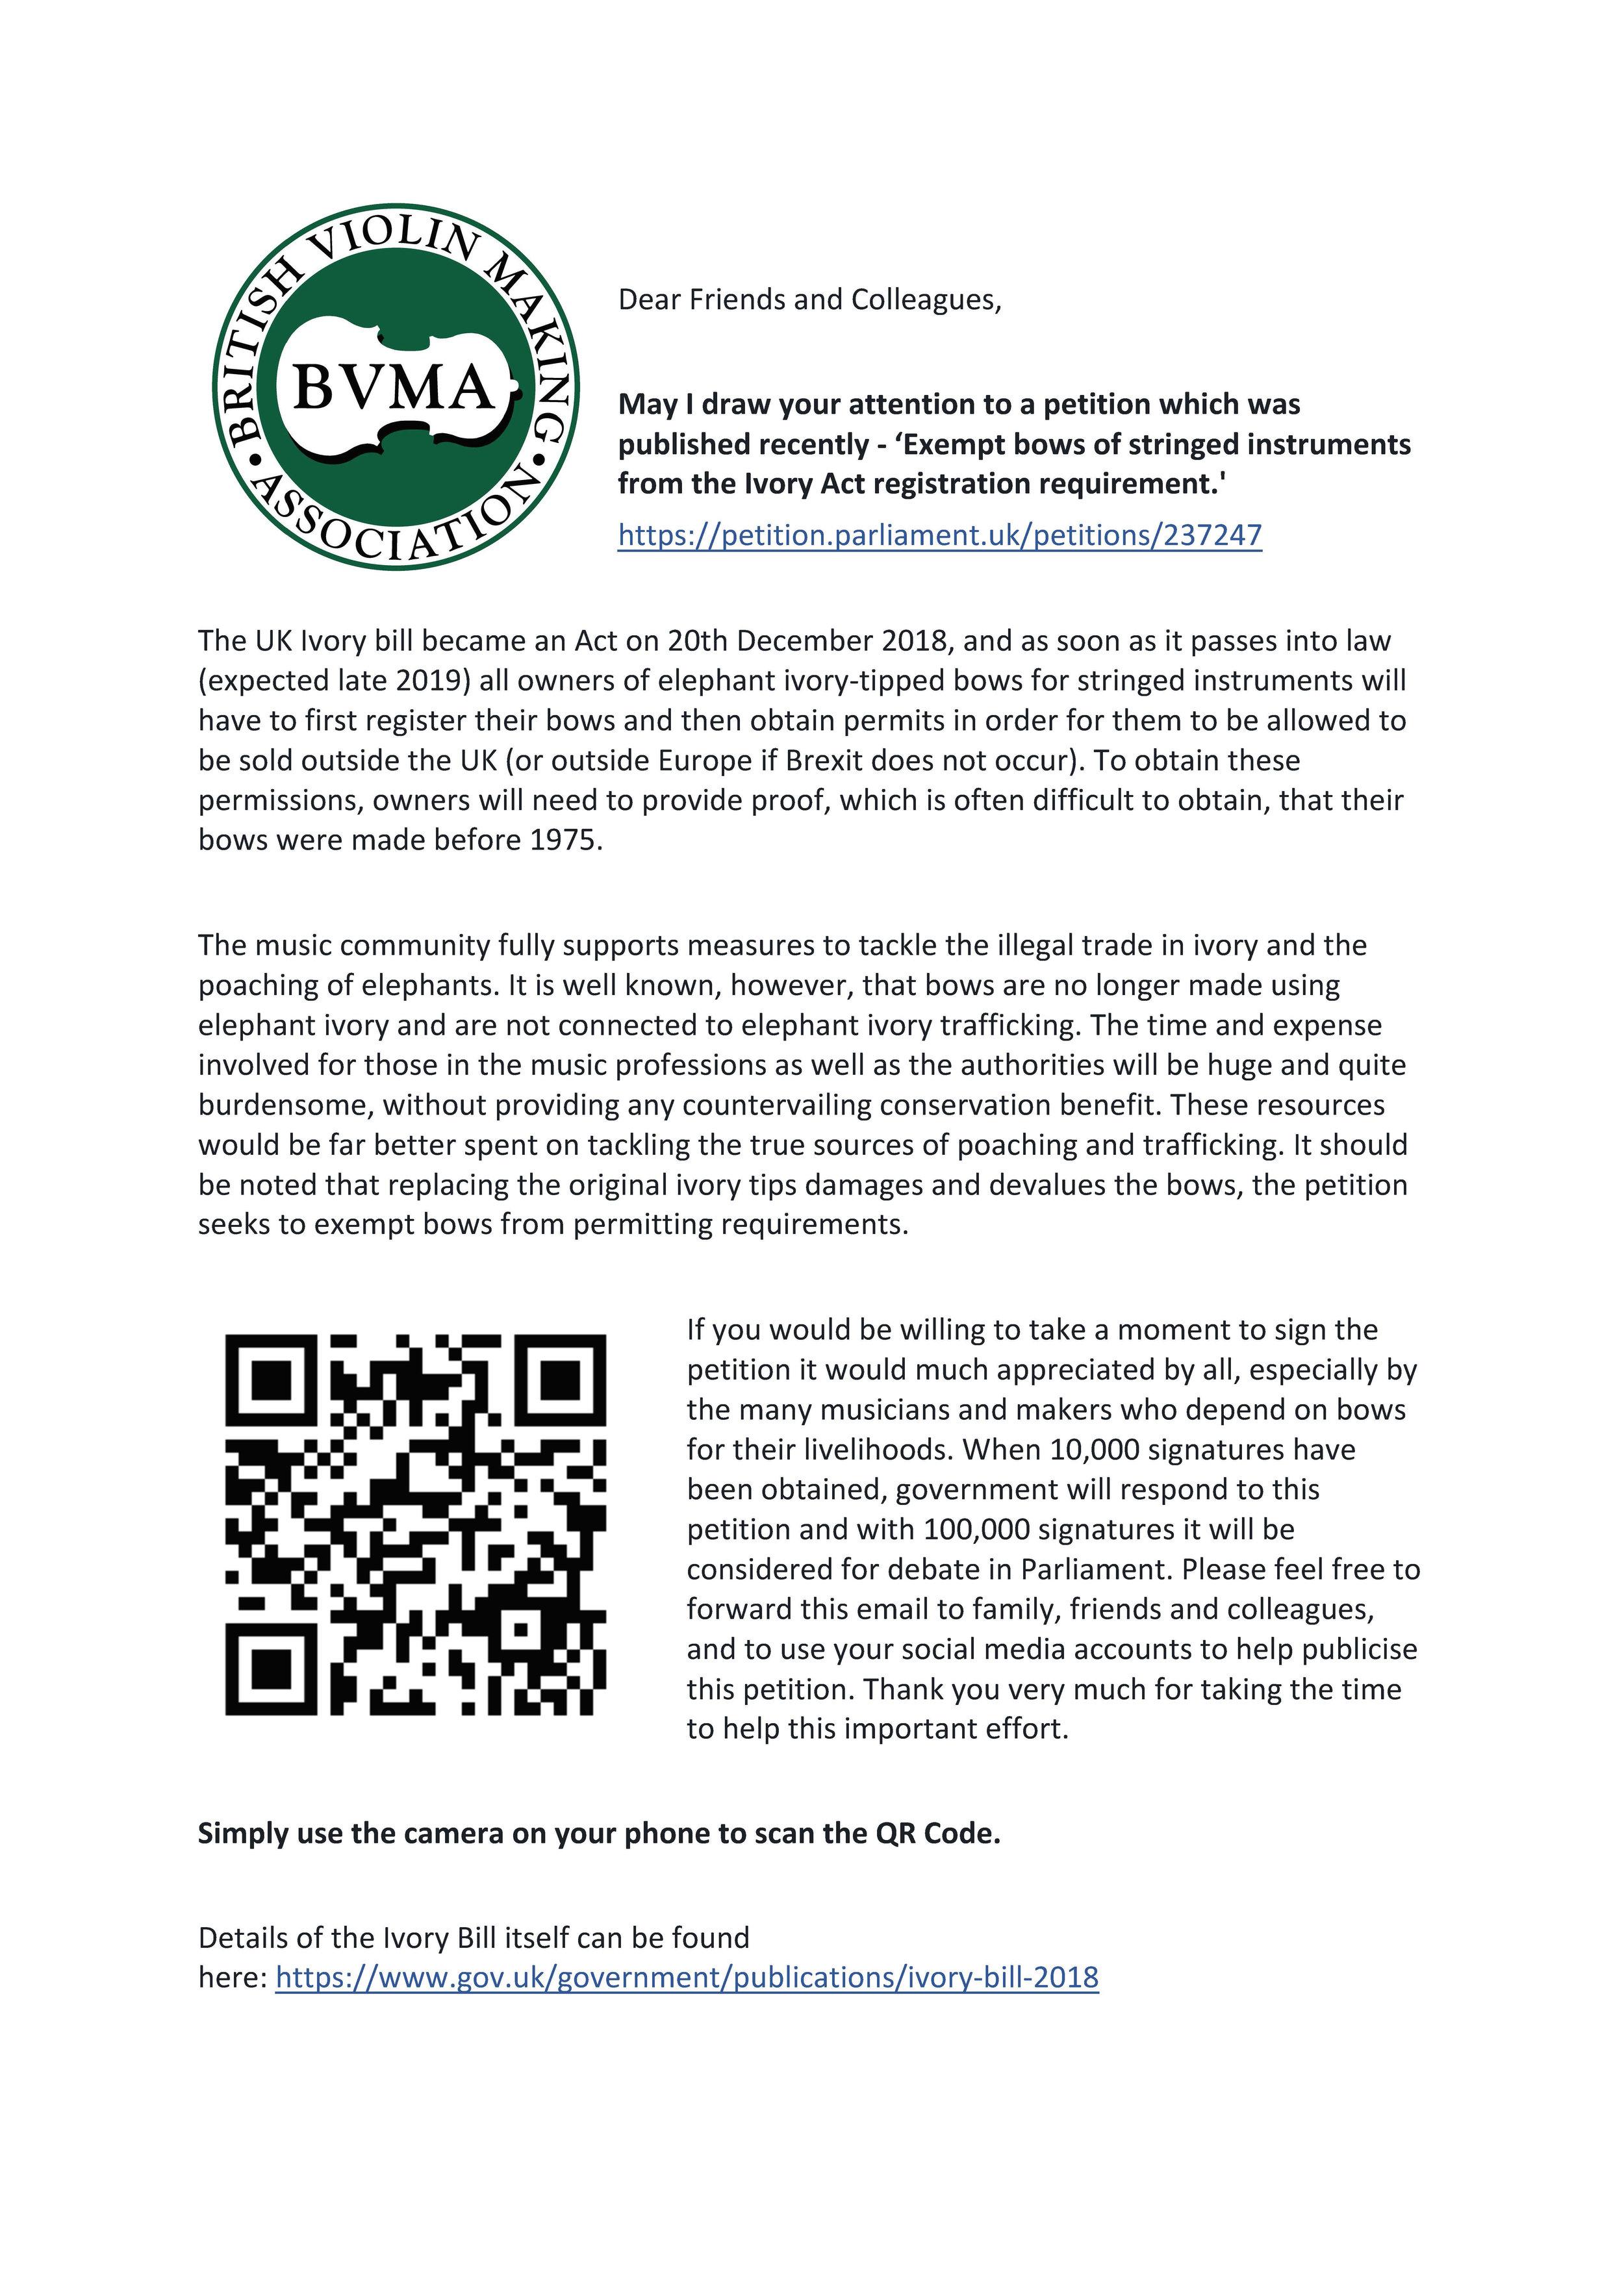 BVMA ivory petition QR.jpg